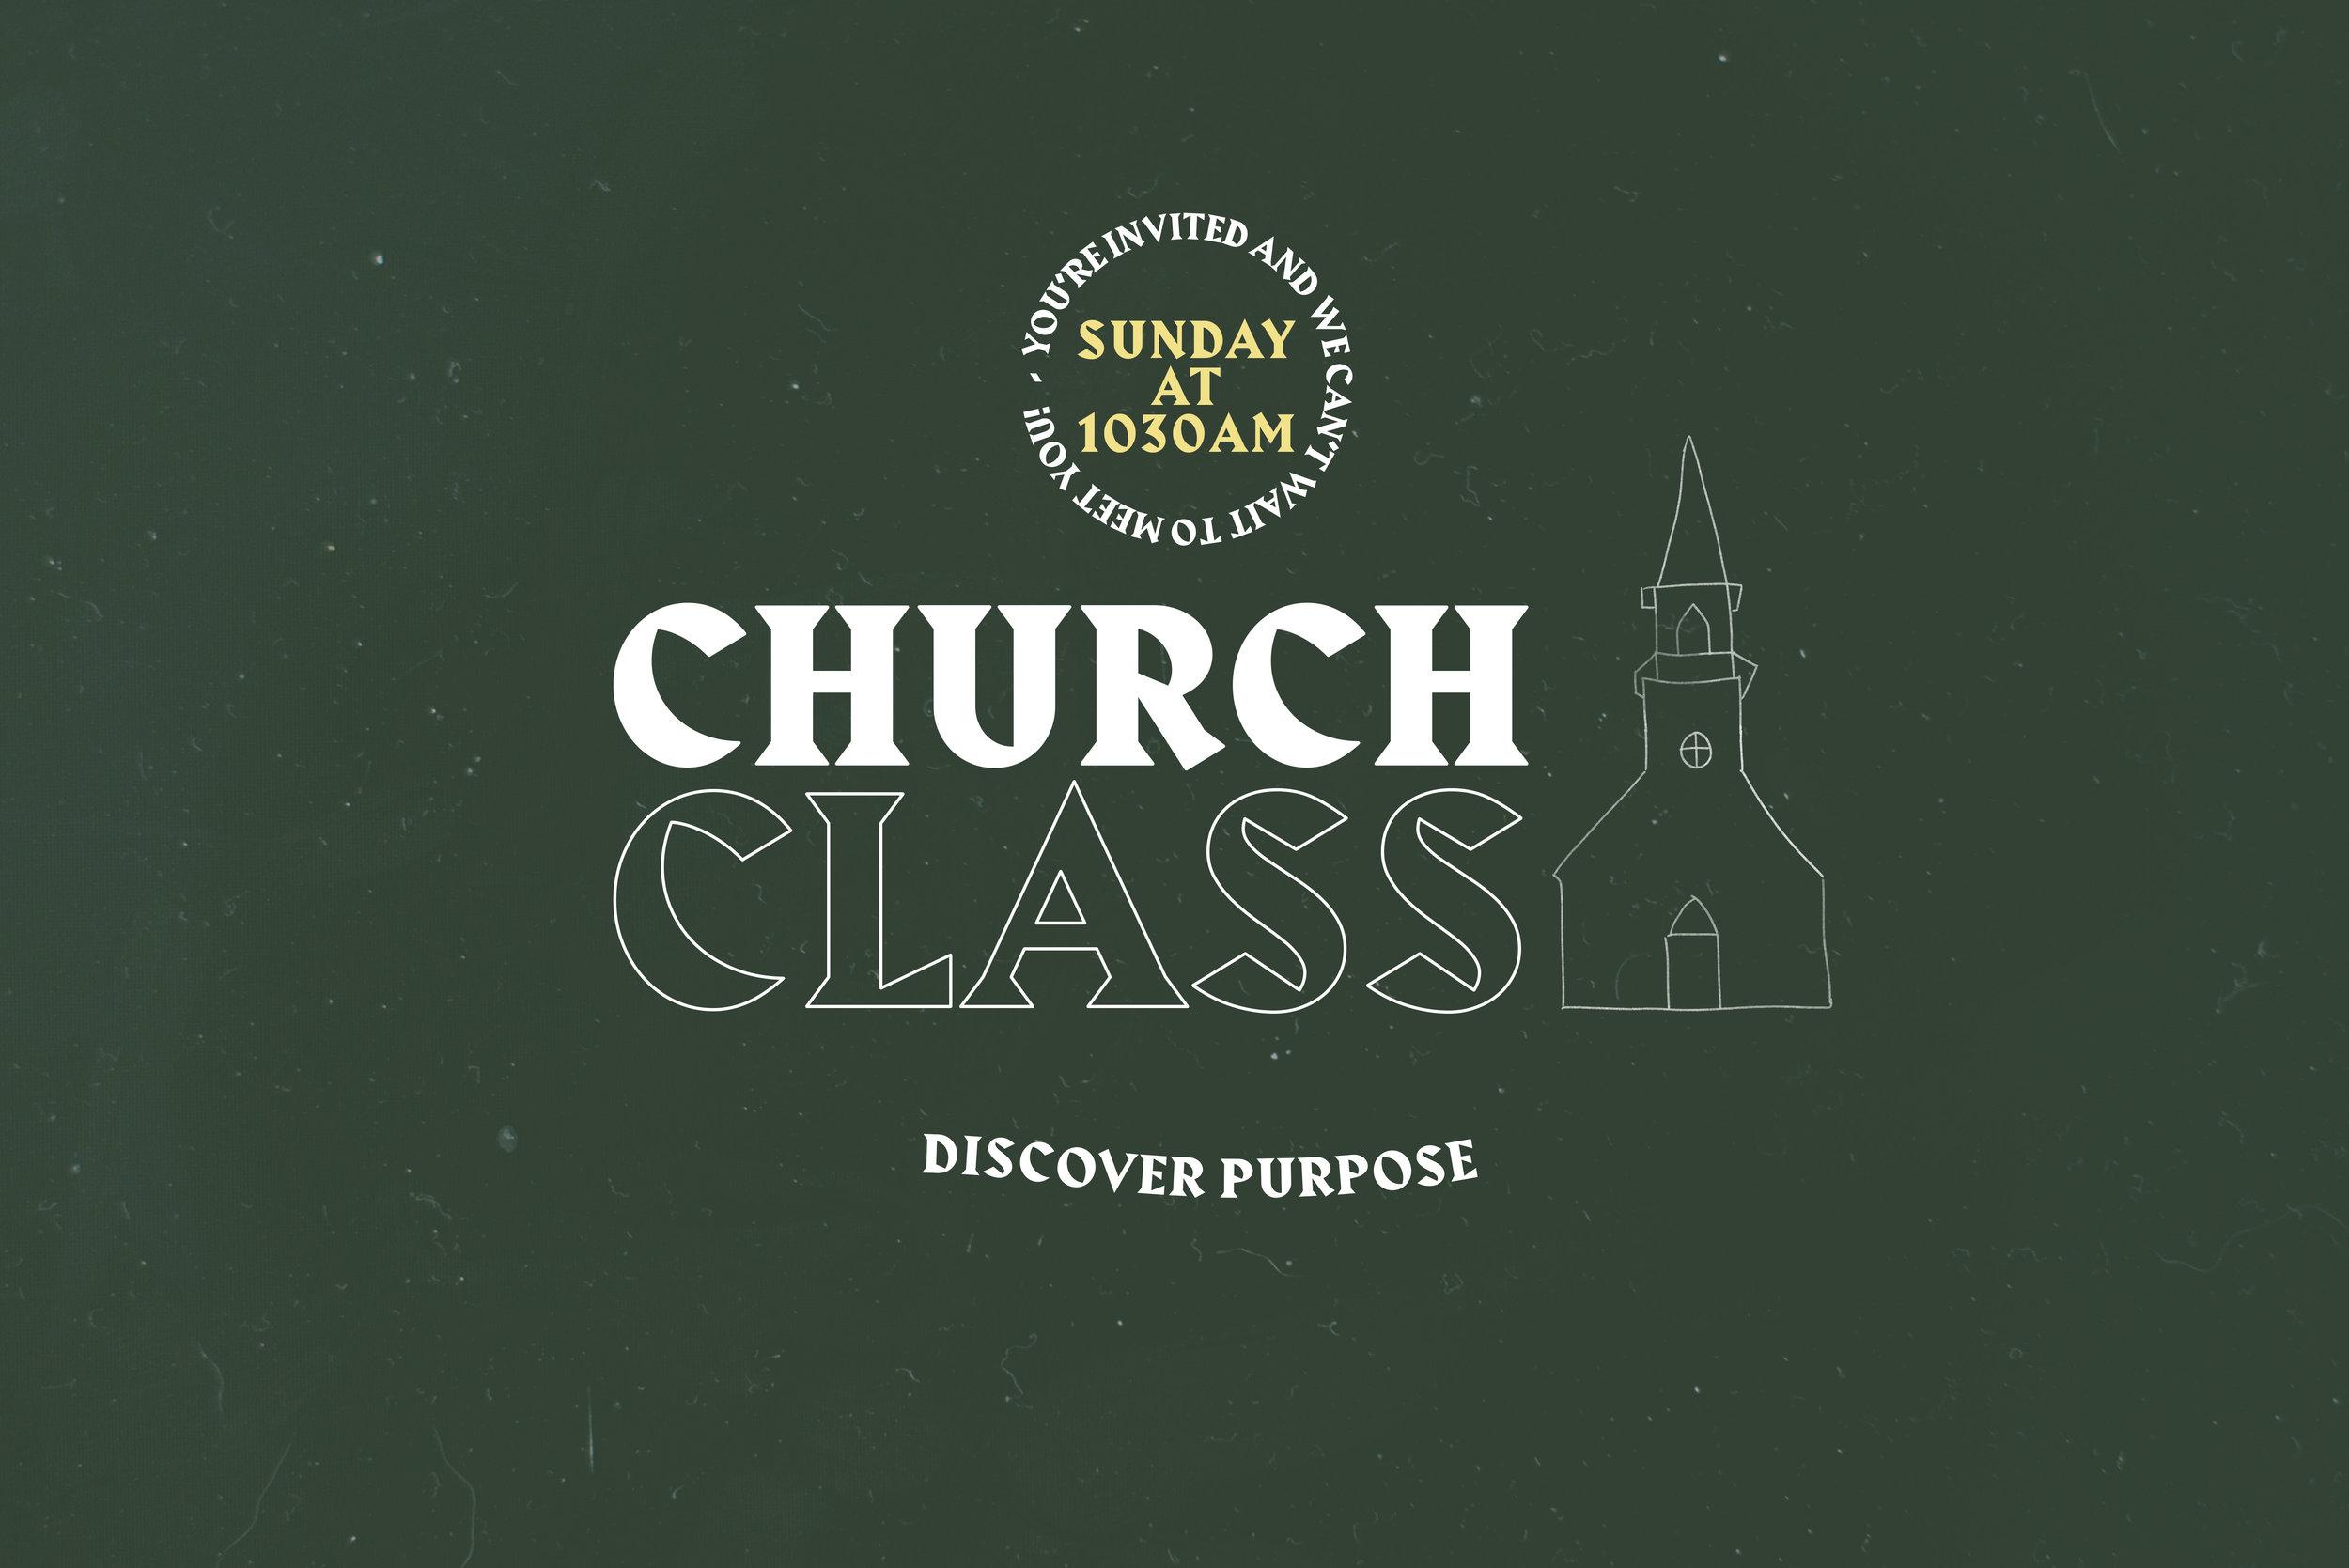 Church Class CORE.jpg